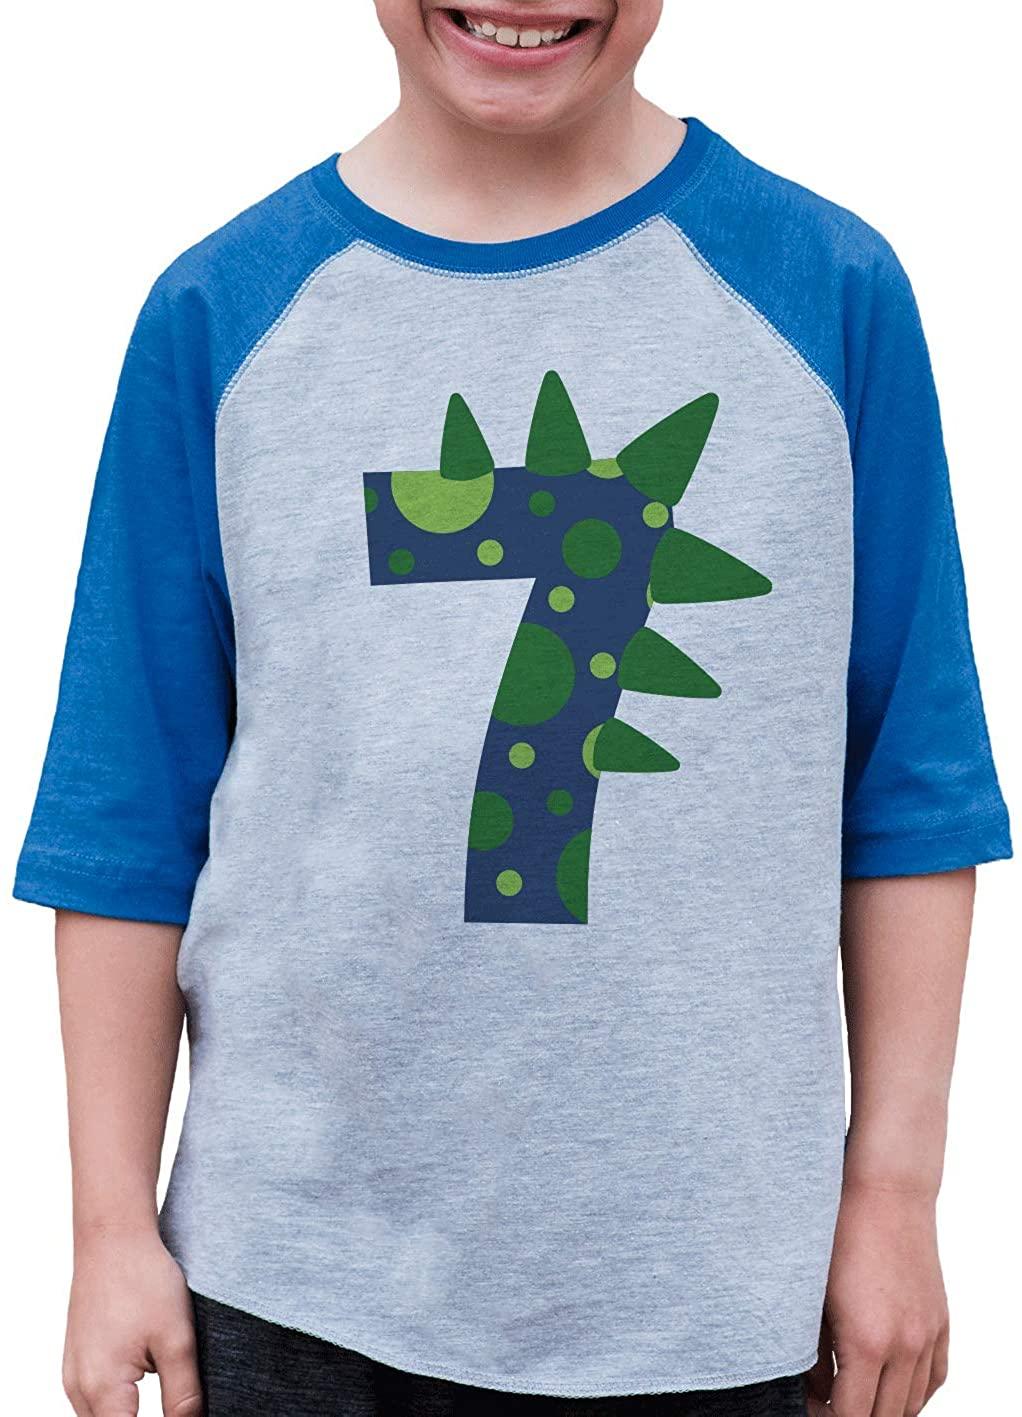 7 ate 9 Apparel Boy's Seven Dinosaur 7th Birthday Blue Raglan Tee